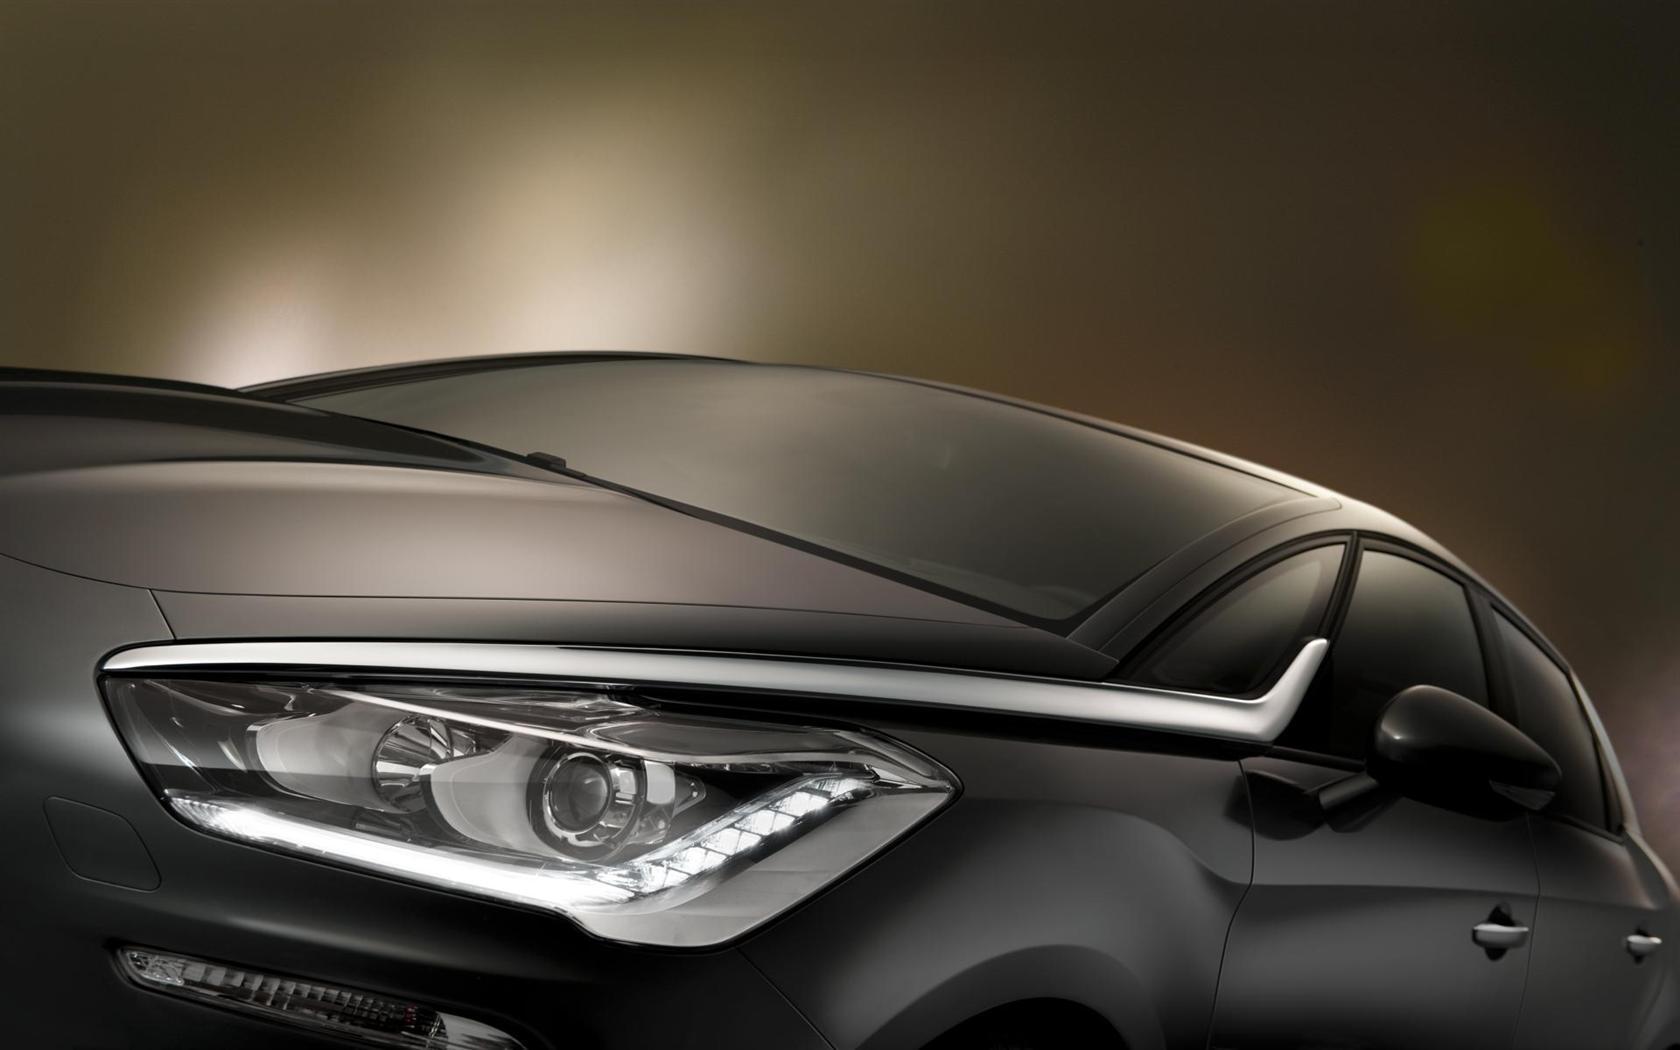 2012 Citroen DS5 Hatchback Image Wallpaper For Ipad